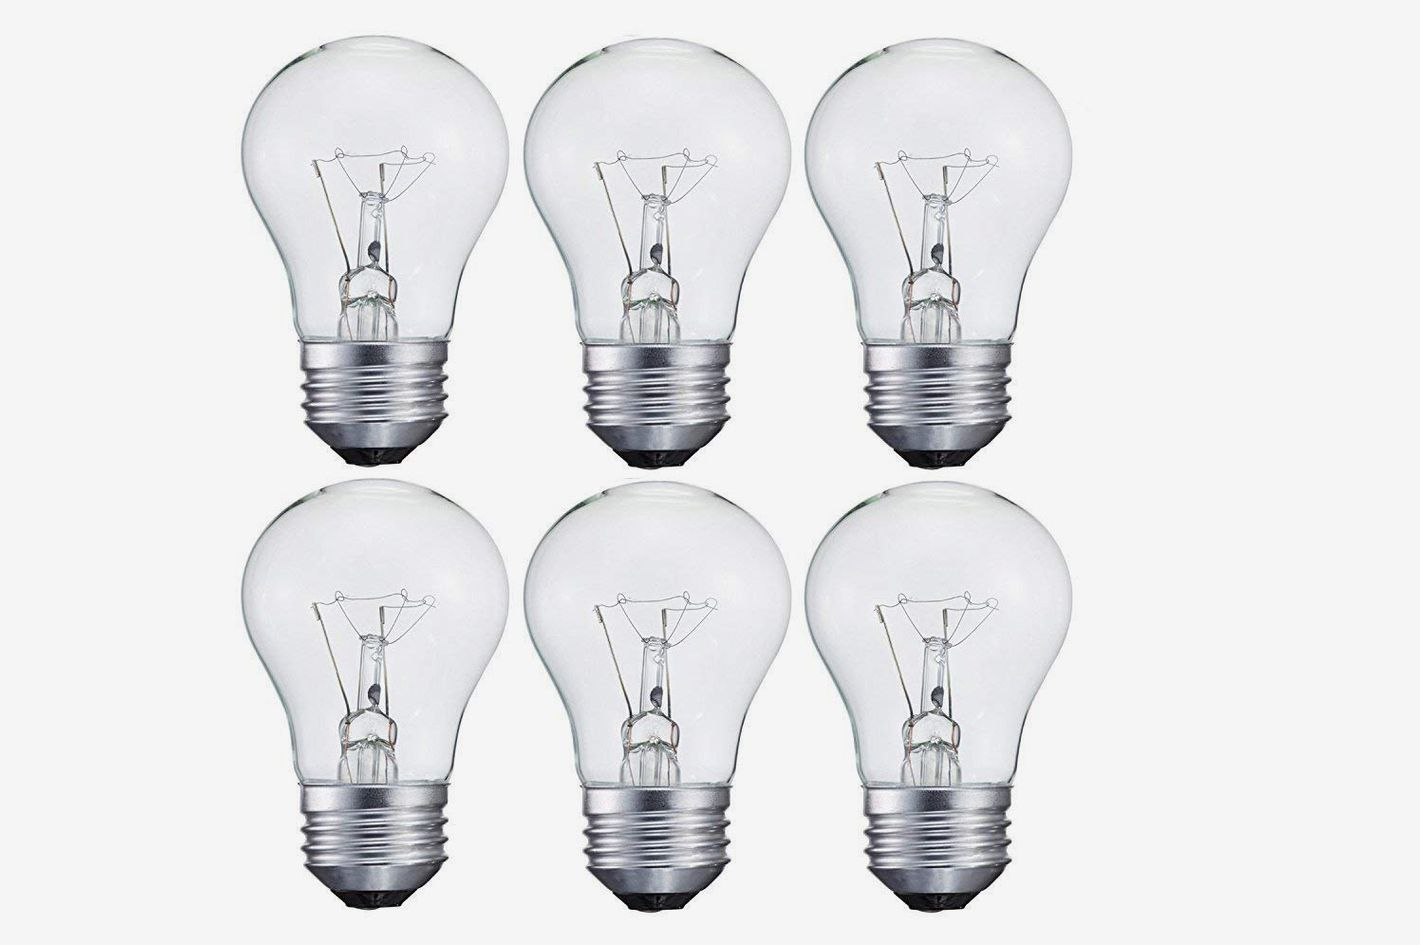 15-Watt Decorative A15 Incandescent Light Bulb, 6-Pack